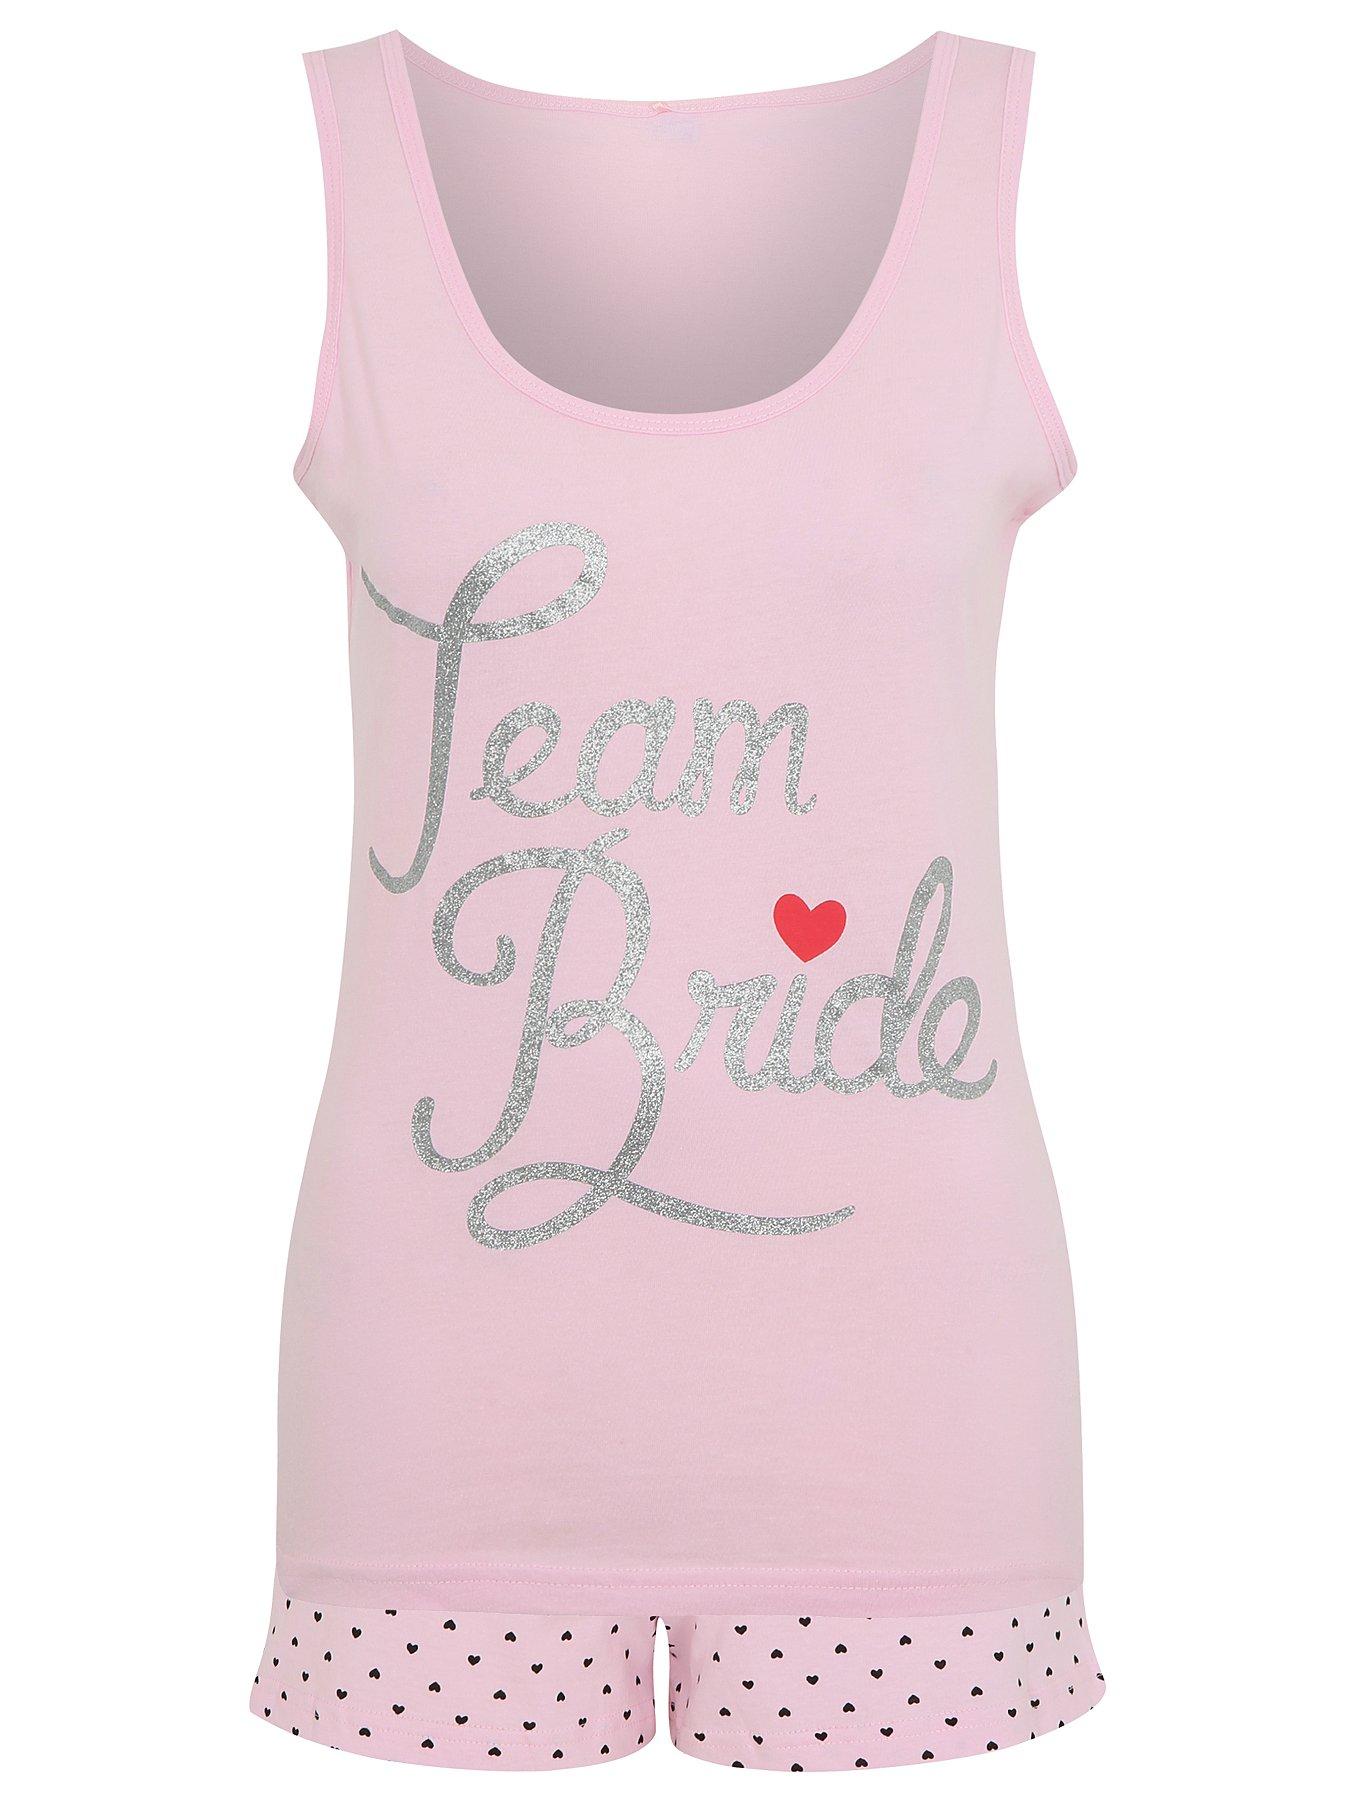 Team Bride Pyjama Set Women George At Asda